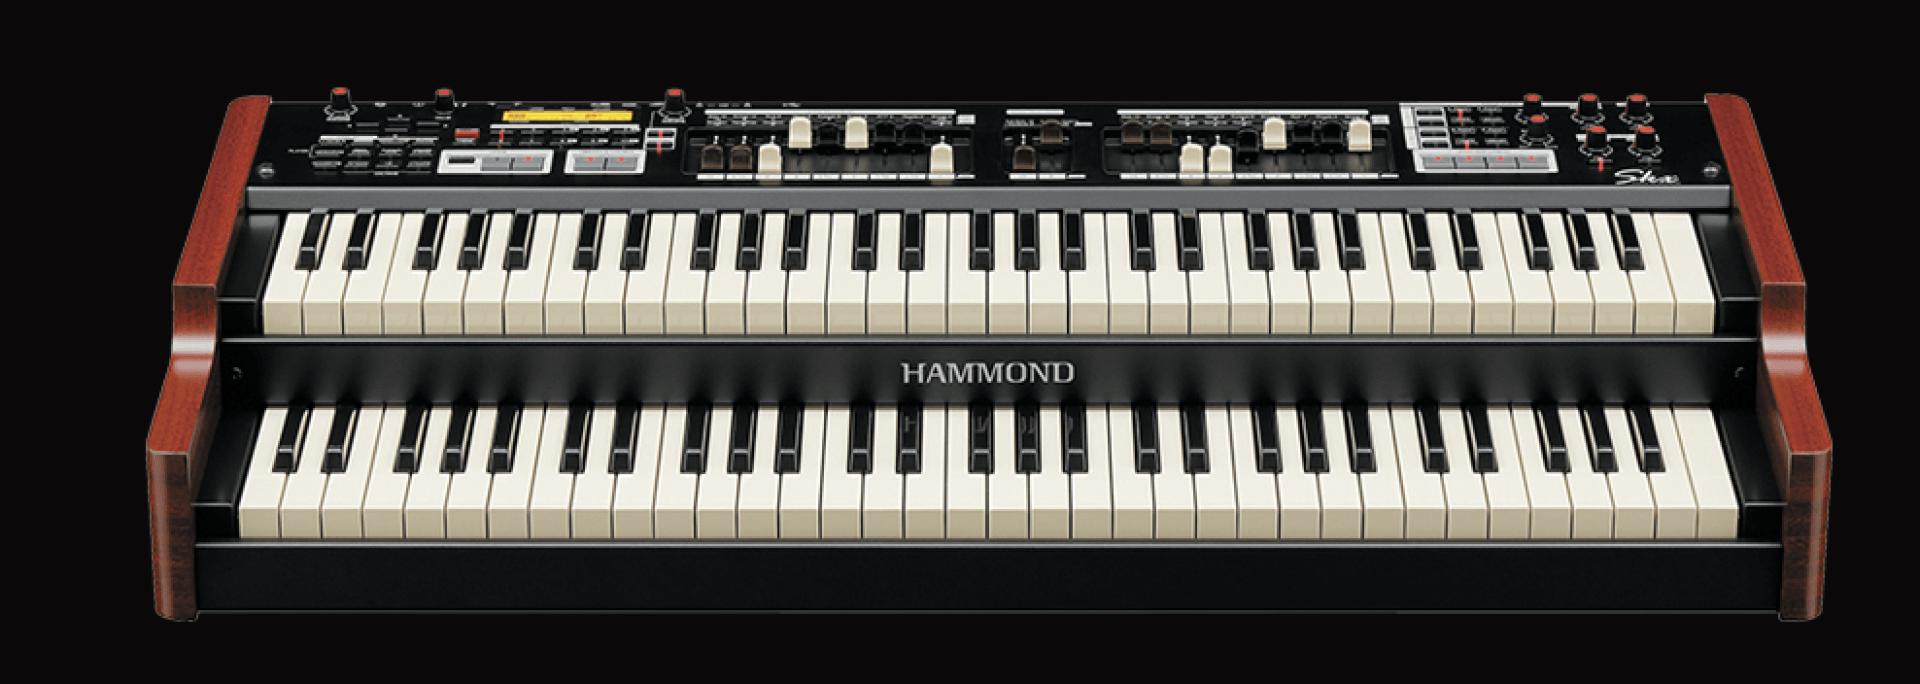 Hammond-organ-with-Leslie